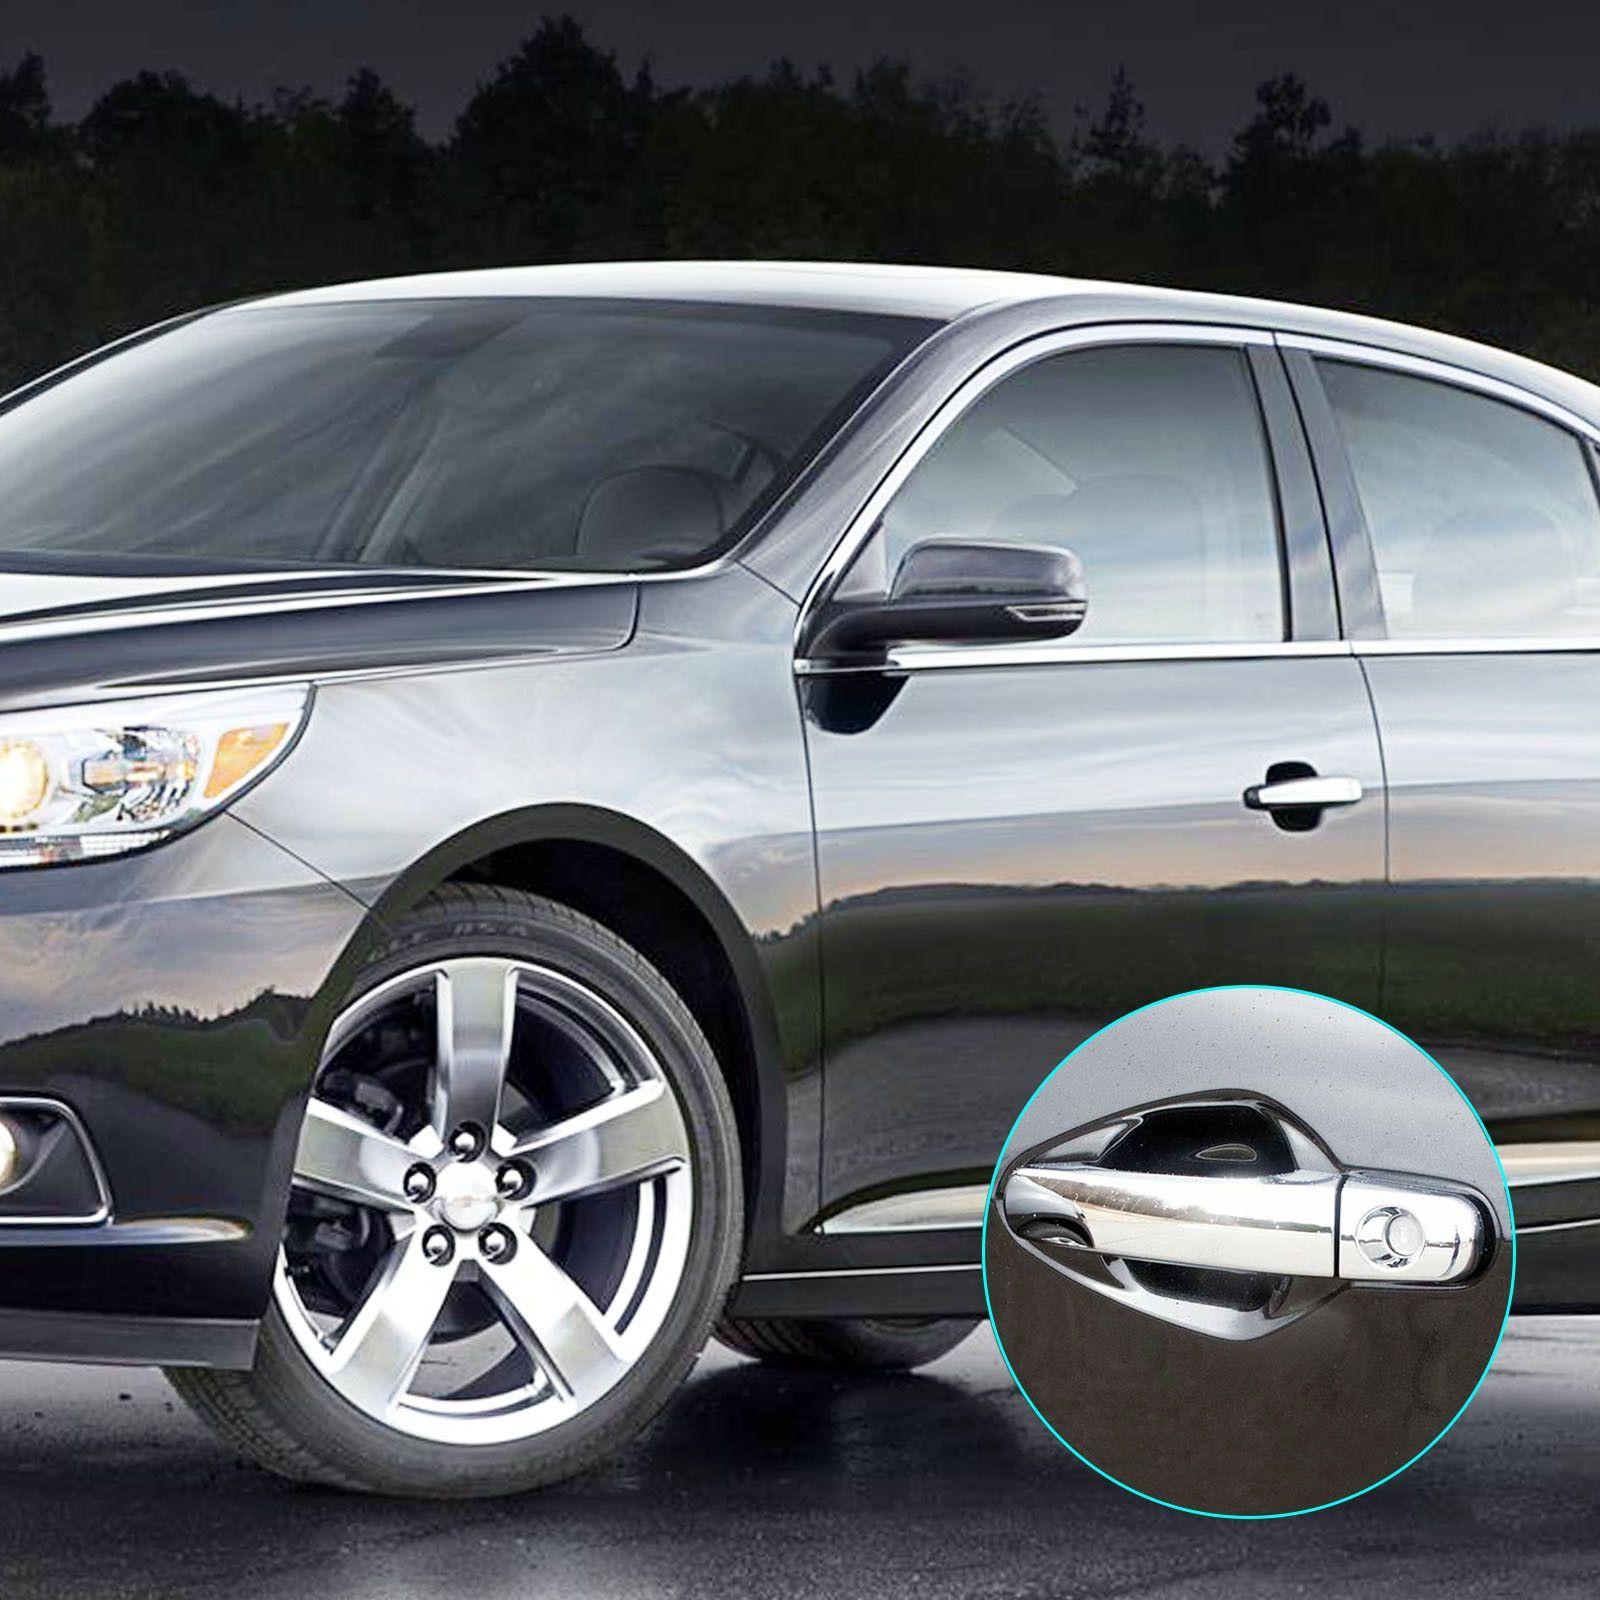 2008 2012 Chevrolet Malibu 2006 2011 Hhr Chrome Mirror Door Handle Cover Abs Chevrolet Malibu Chevrolet Traverse Chevrolet